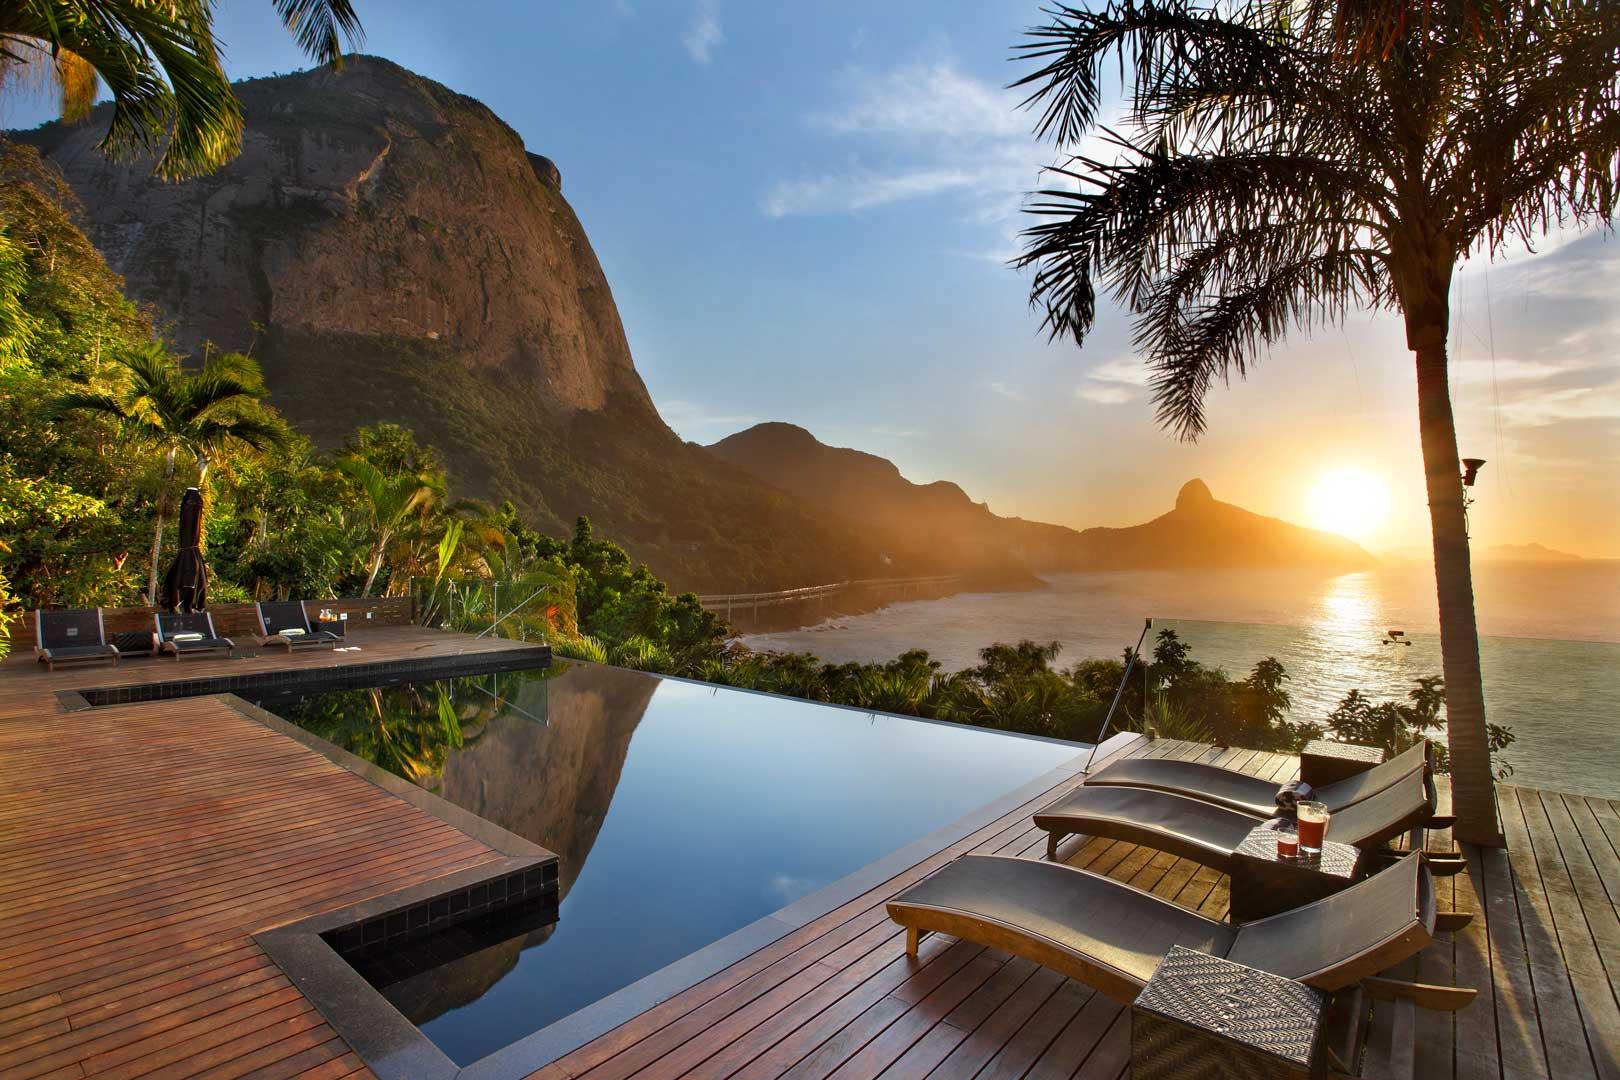 Rio De Janeiro - Villa Joatinga